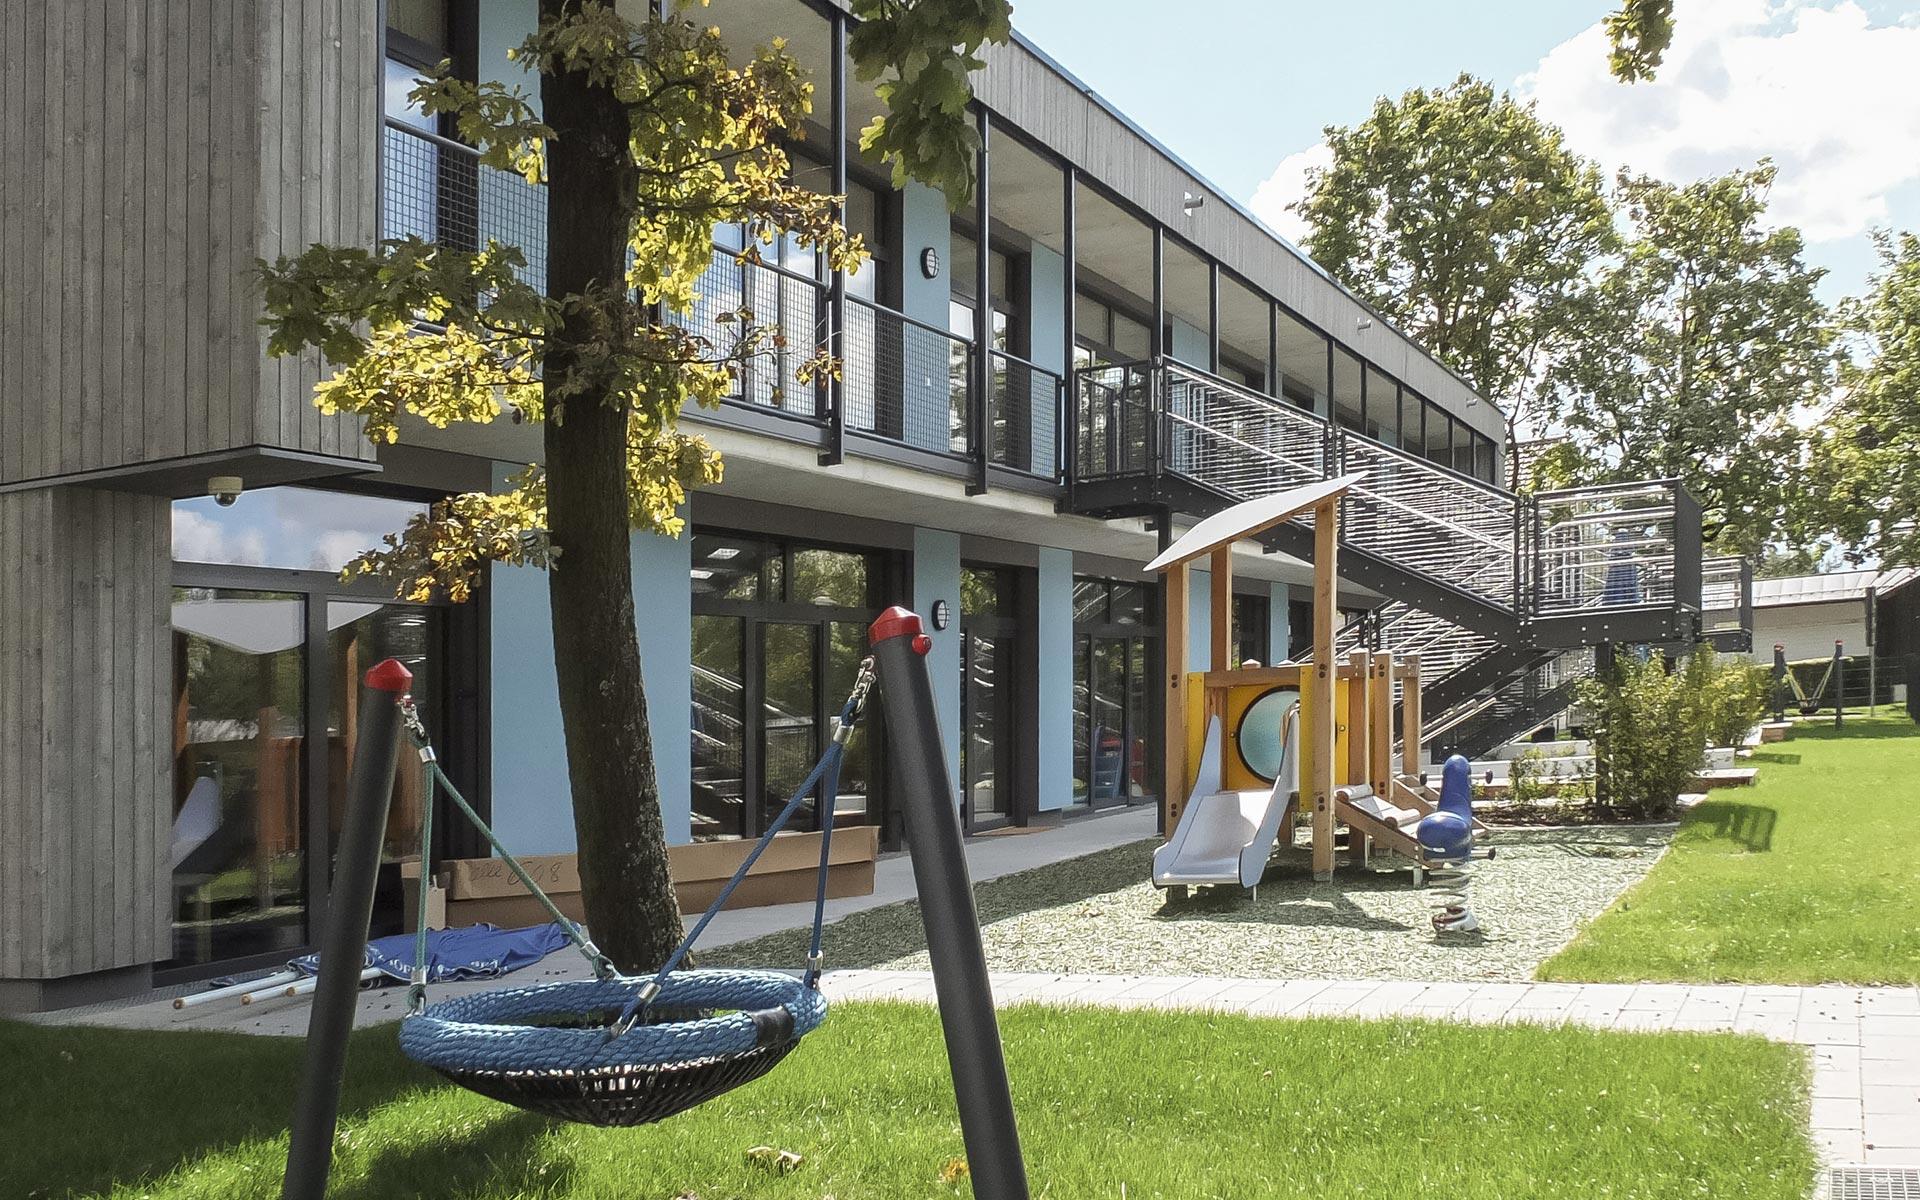 Kinderkrippe Oberschleißheim